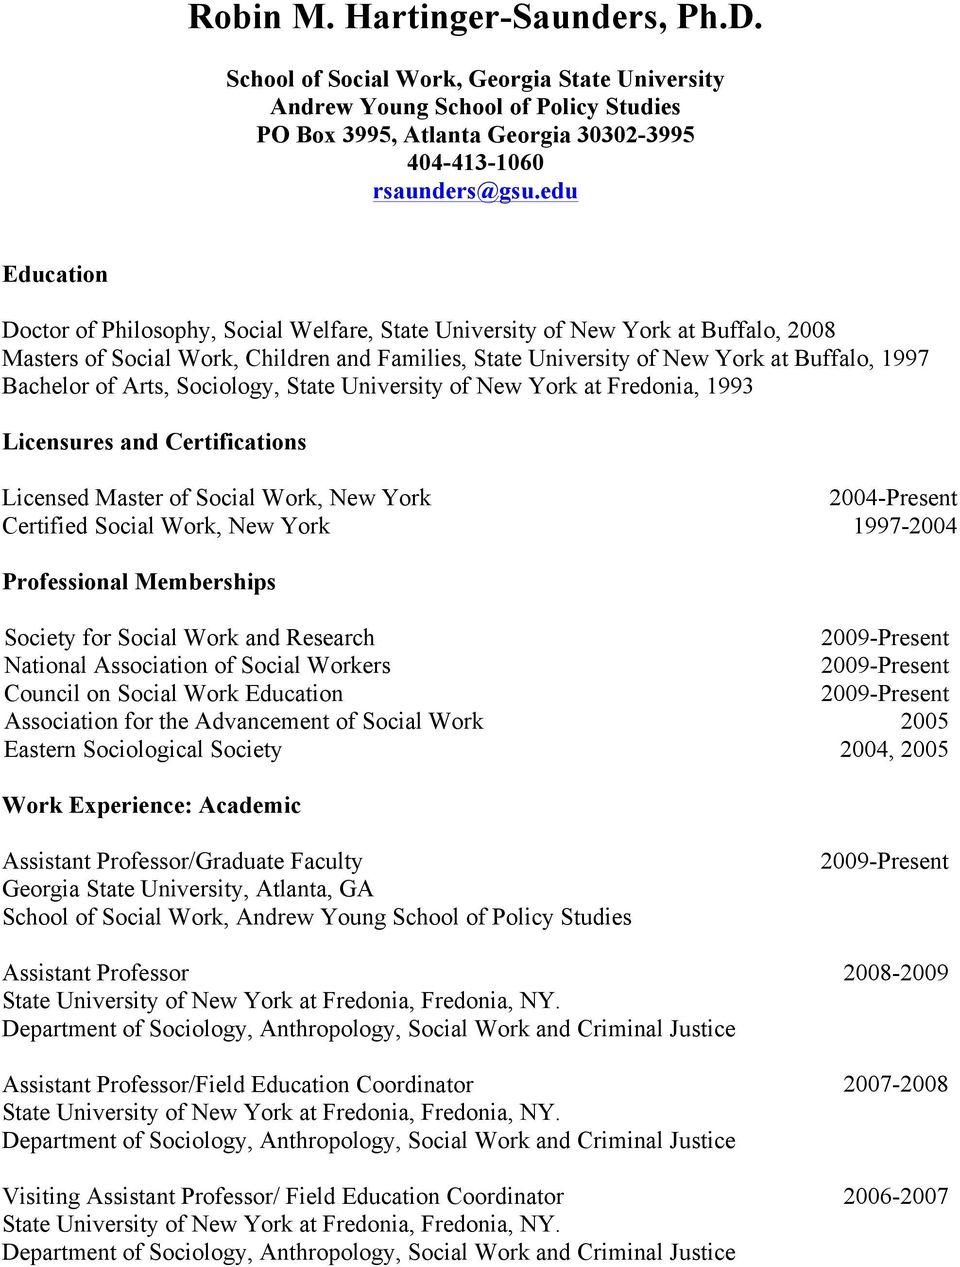 Robin M. Hartinger Saunders, Ph.d. - Pdf Free Download Pertaining To Georgia State University Semester Start Date 2004 - 2005